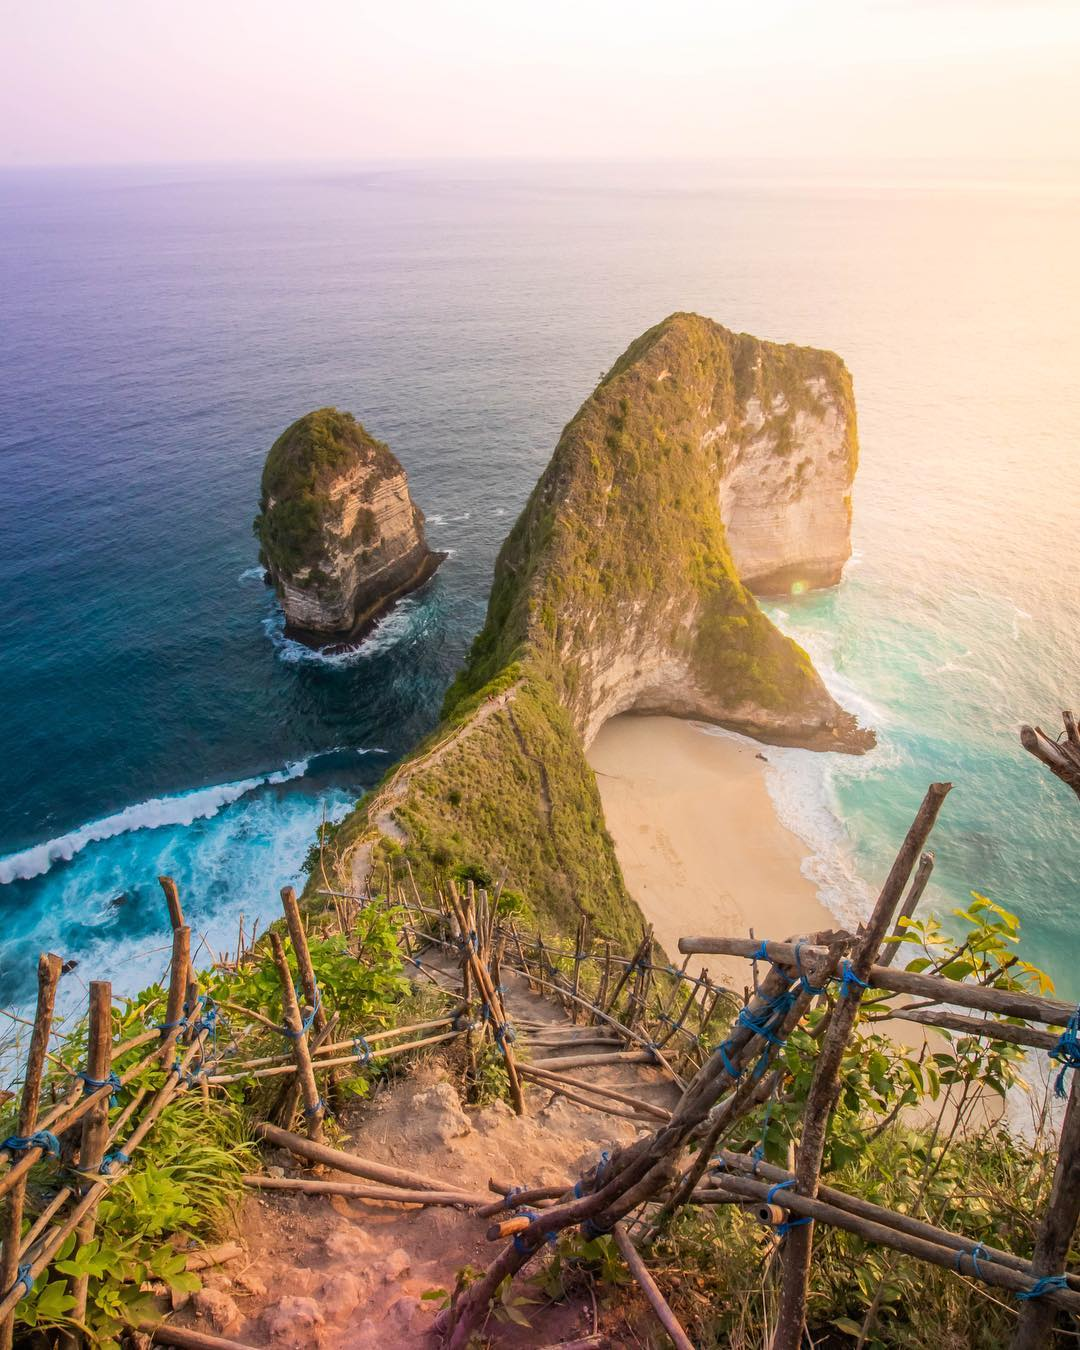 Beaches in Bali; Kelingking Beach